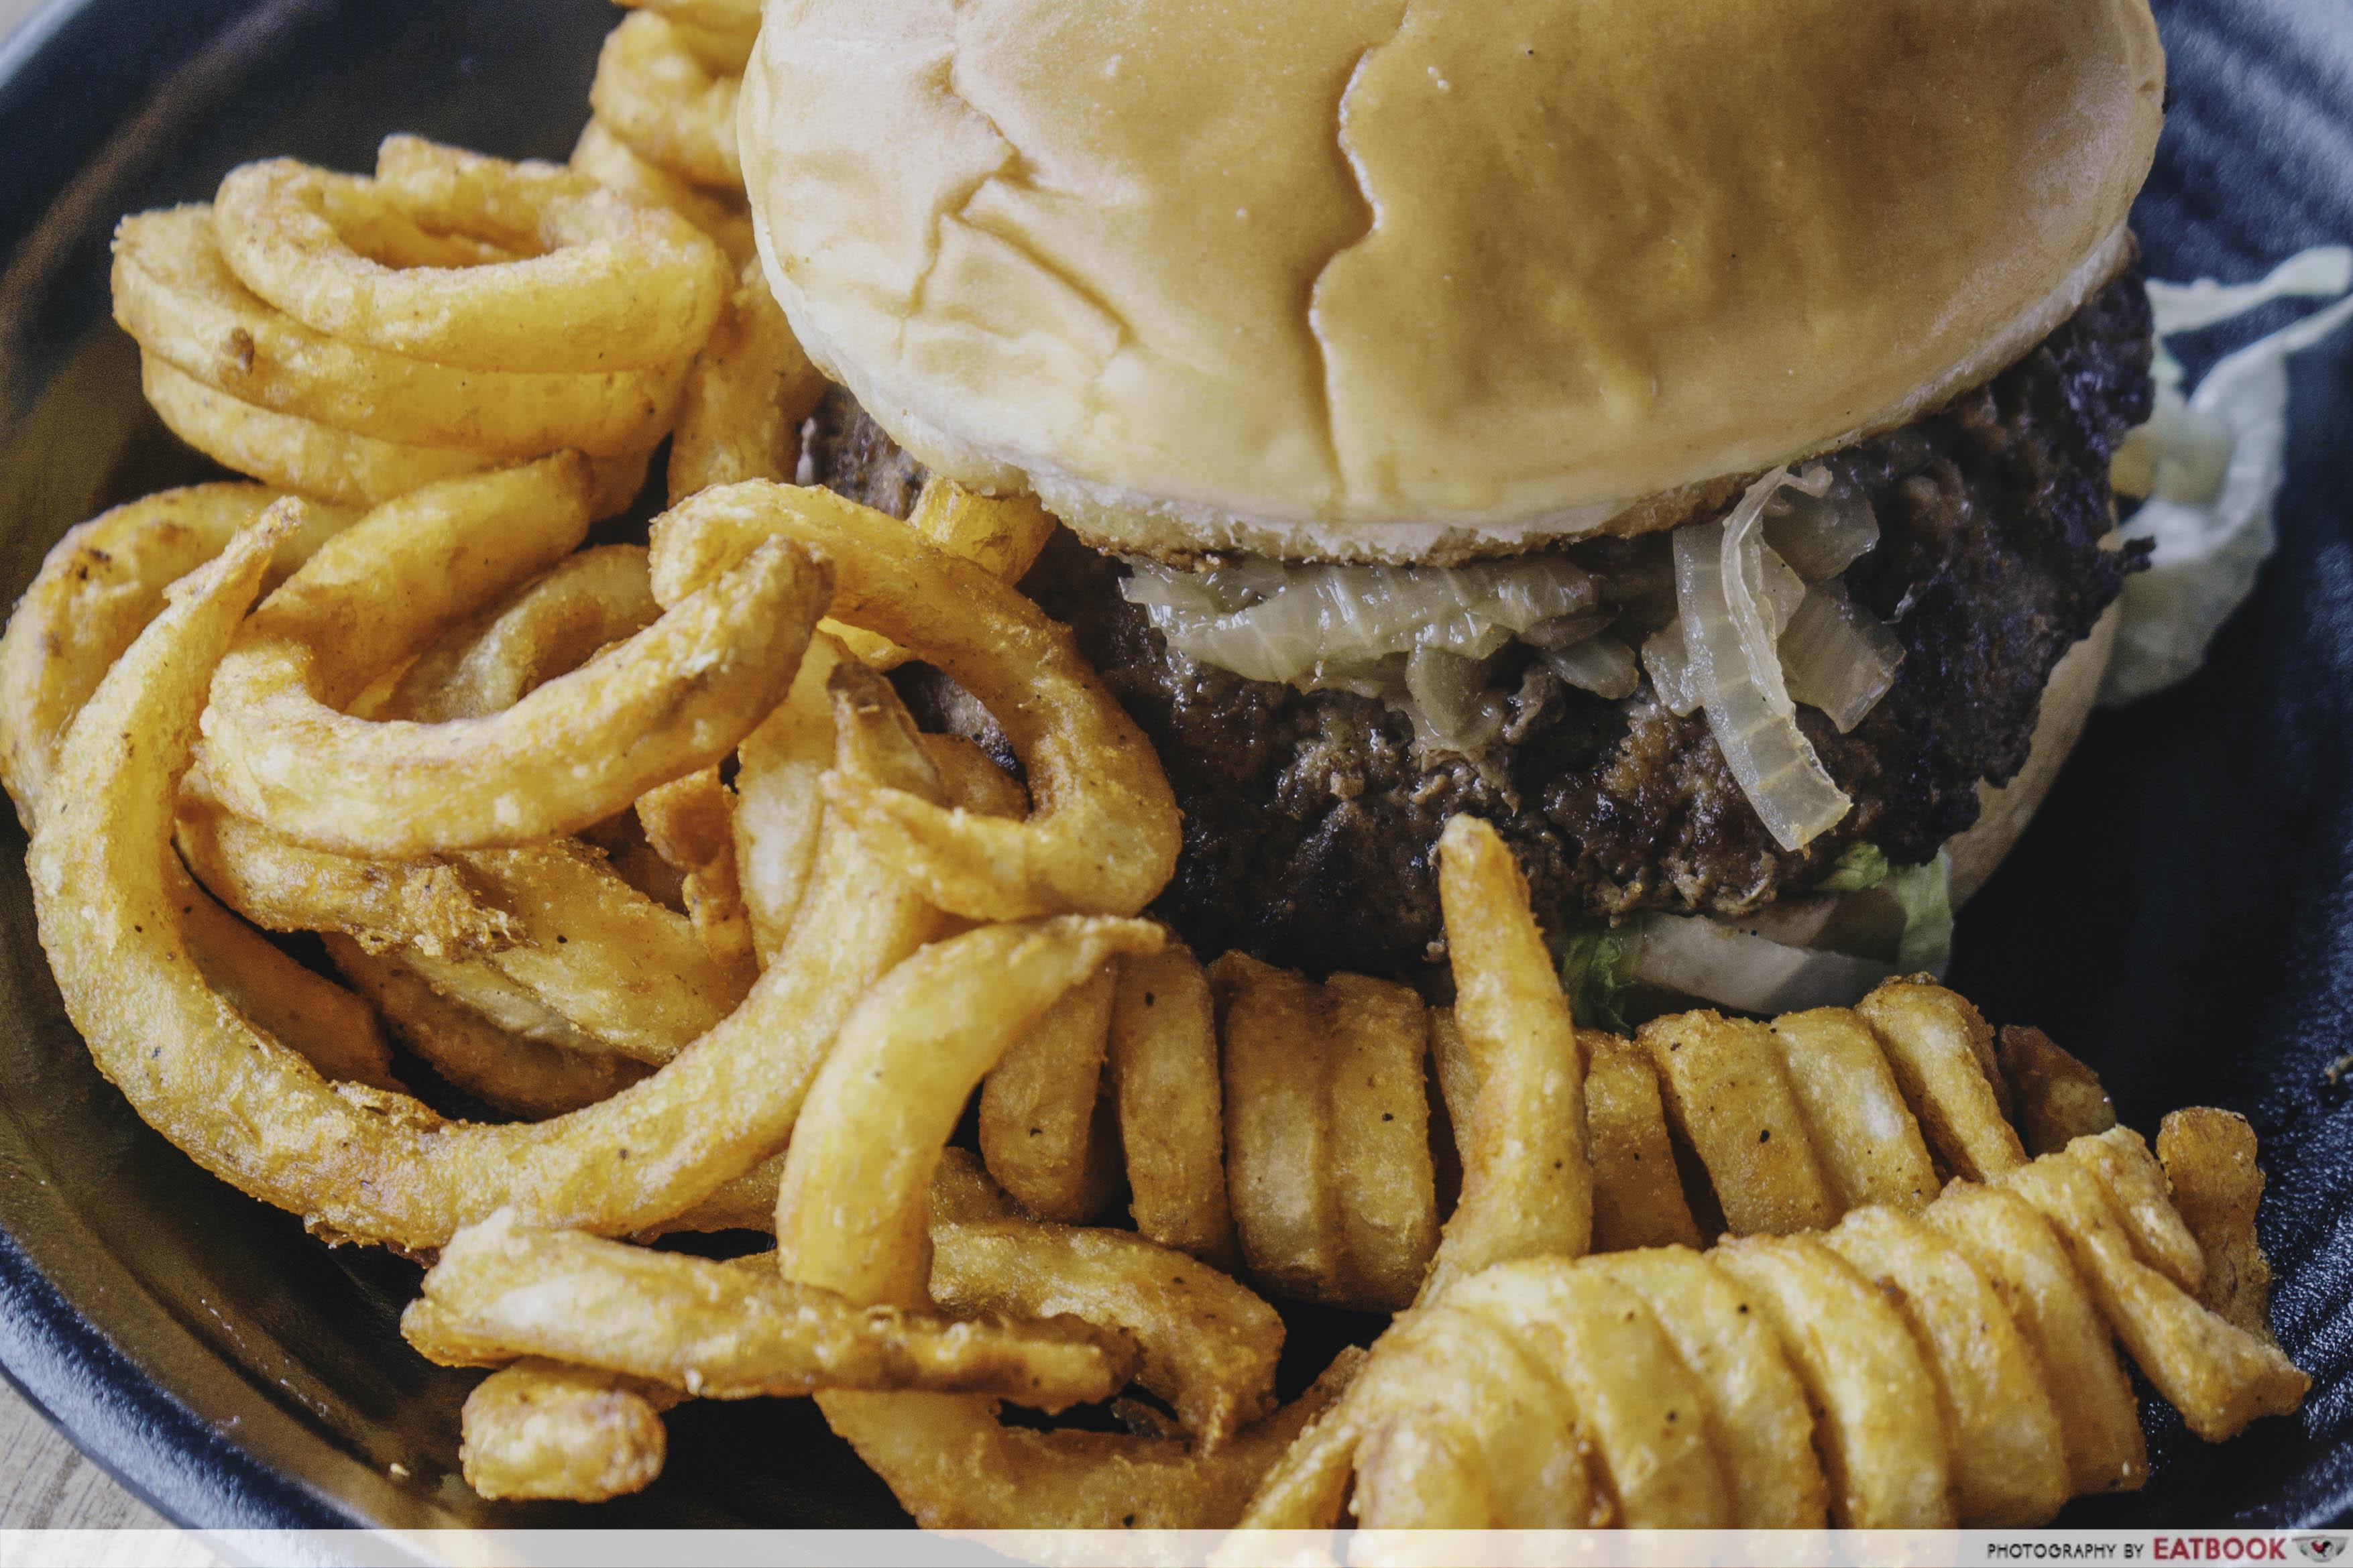 The Humble Burger - Beef Burger Close Up